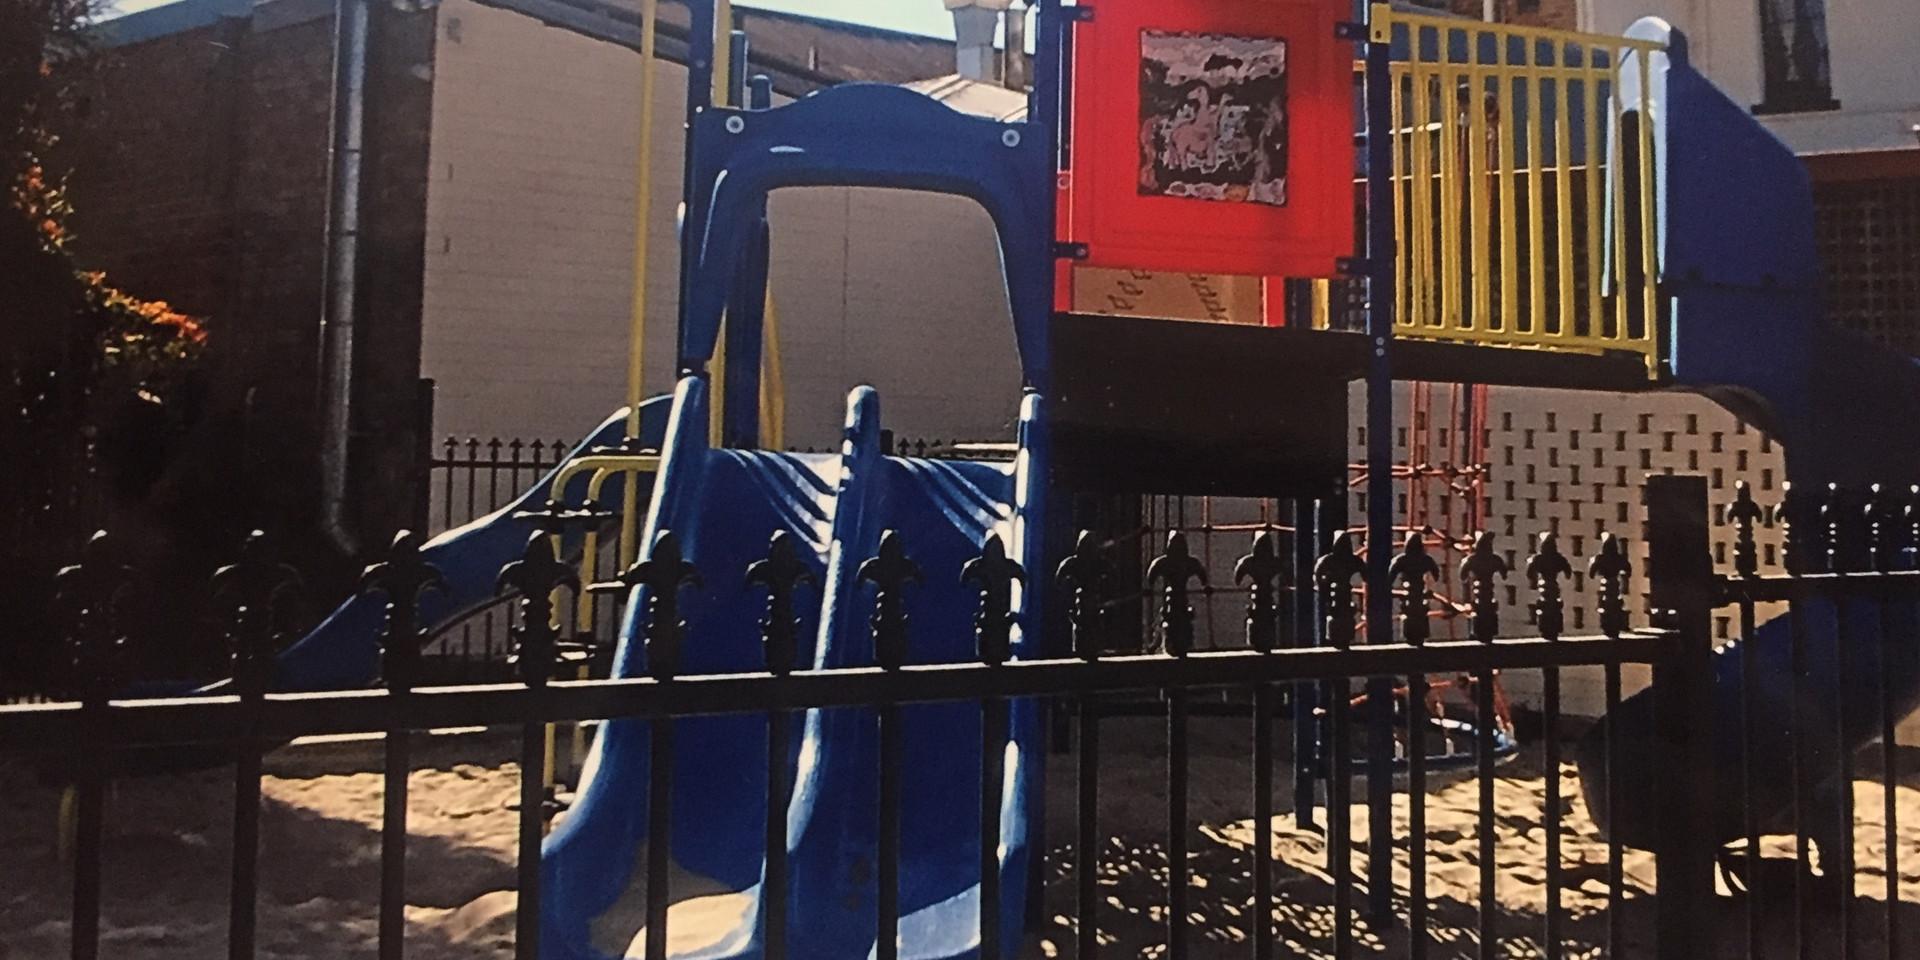 Eatons Hotel 2000's playground